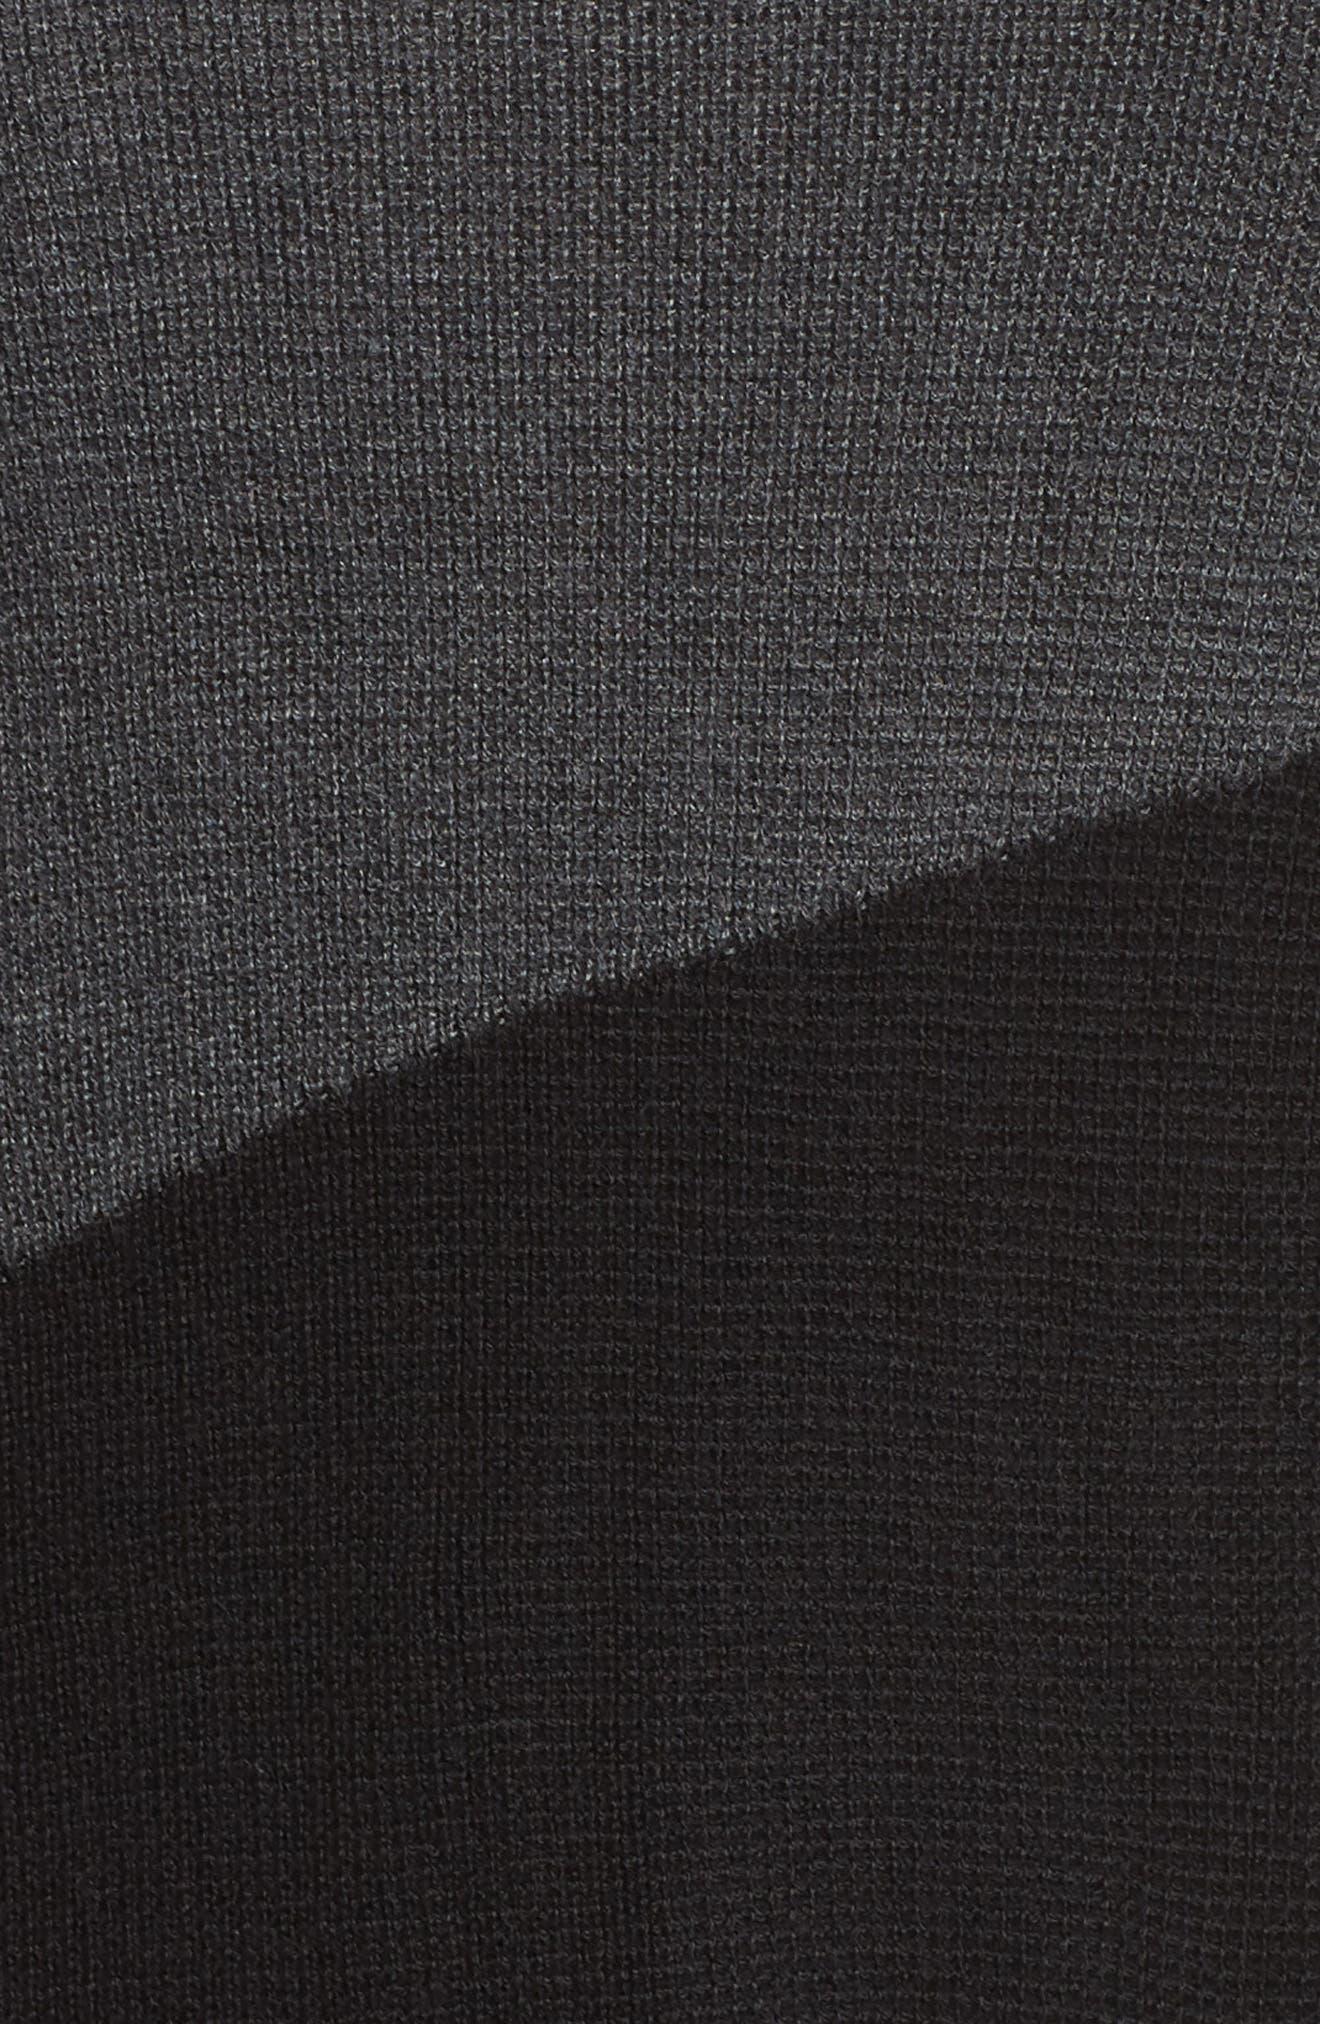 Asymmetrical Colorblock Sweater,                             Alternate thumbnail 5, color,                             MEDIUM HEATHER GREY